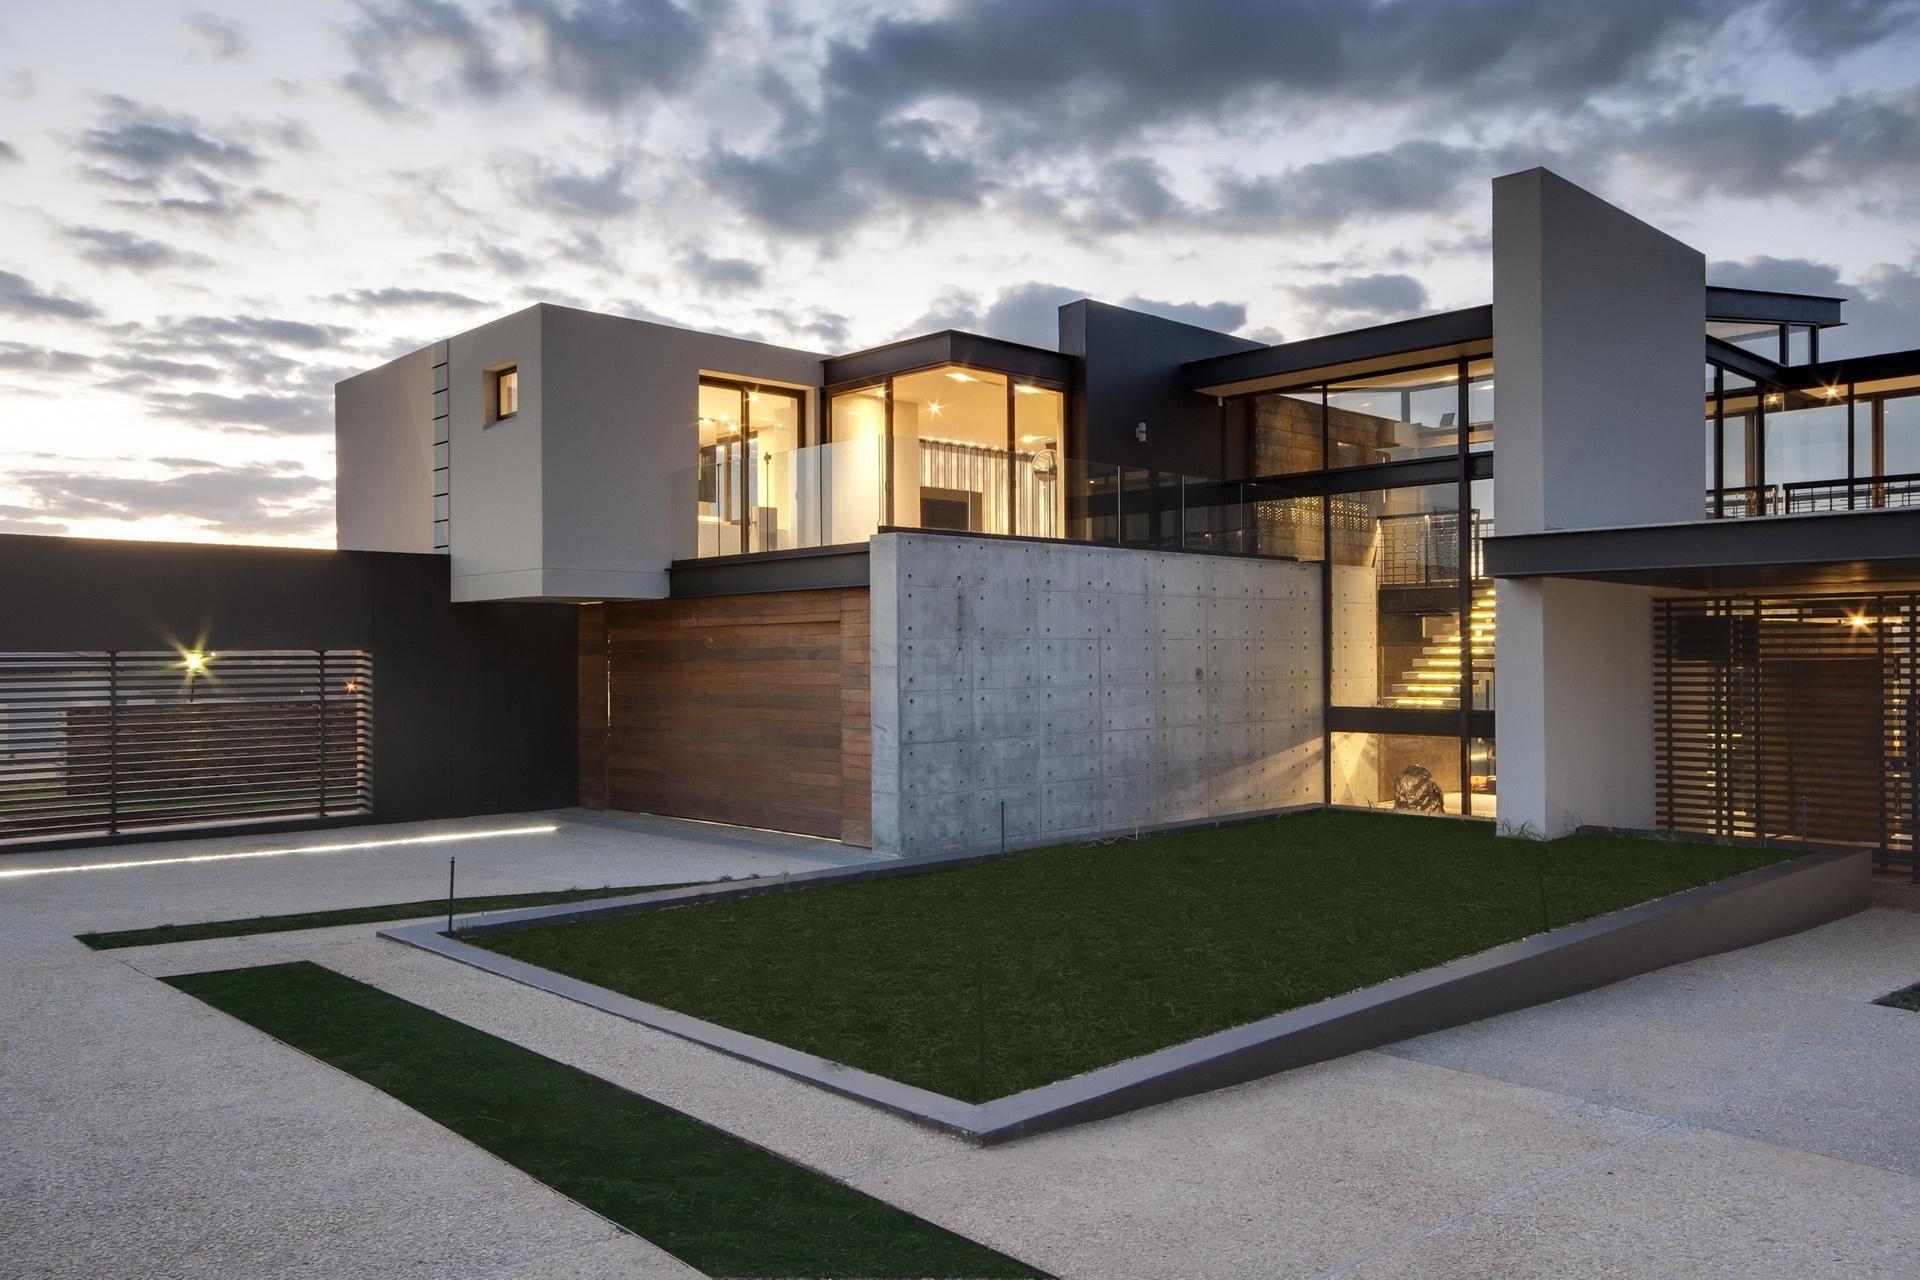 House Boz by Nico van der Meulen